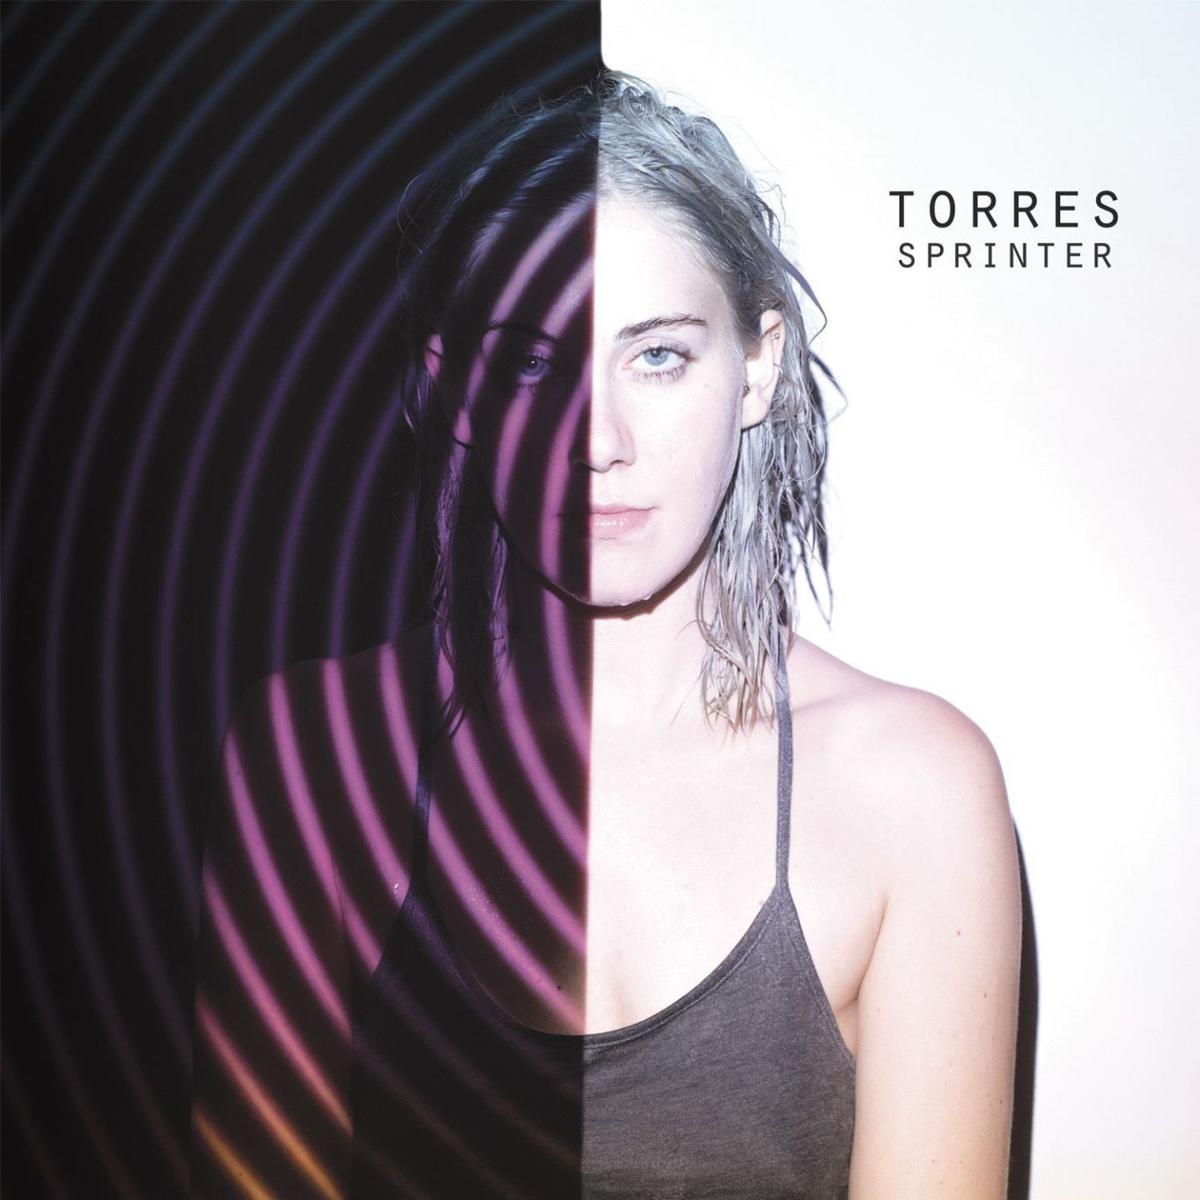 Torres, 'Sprinter,' Partisan